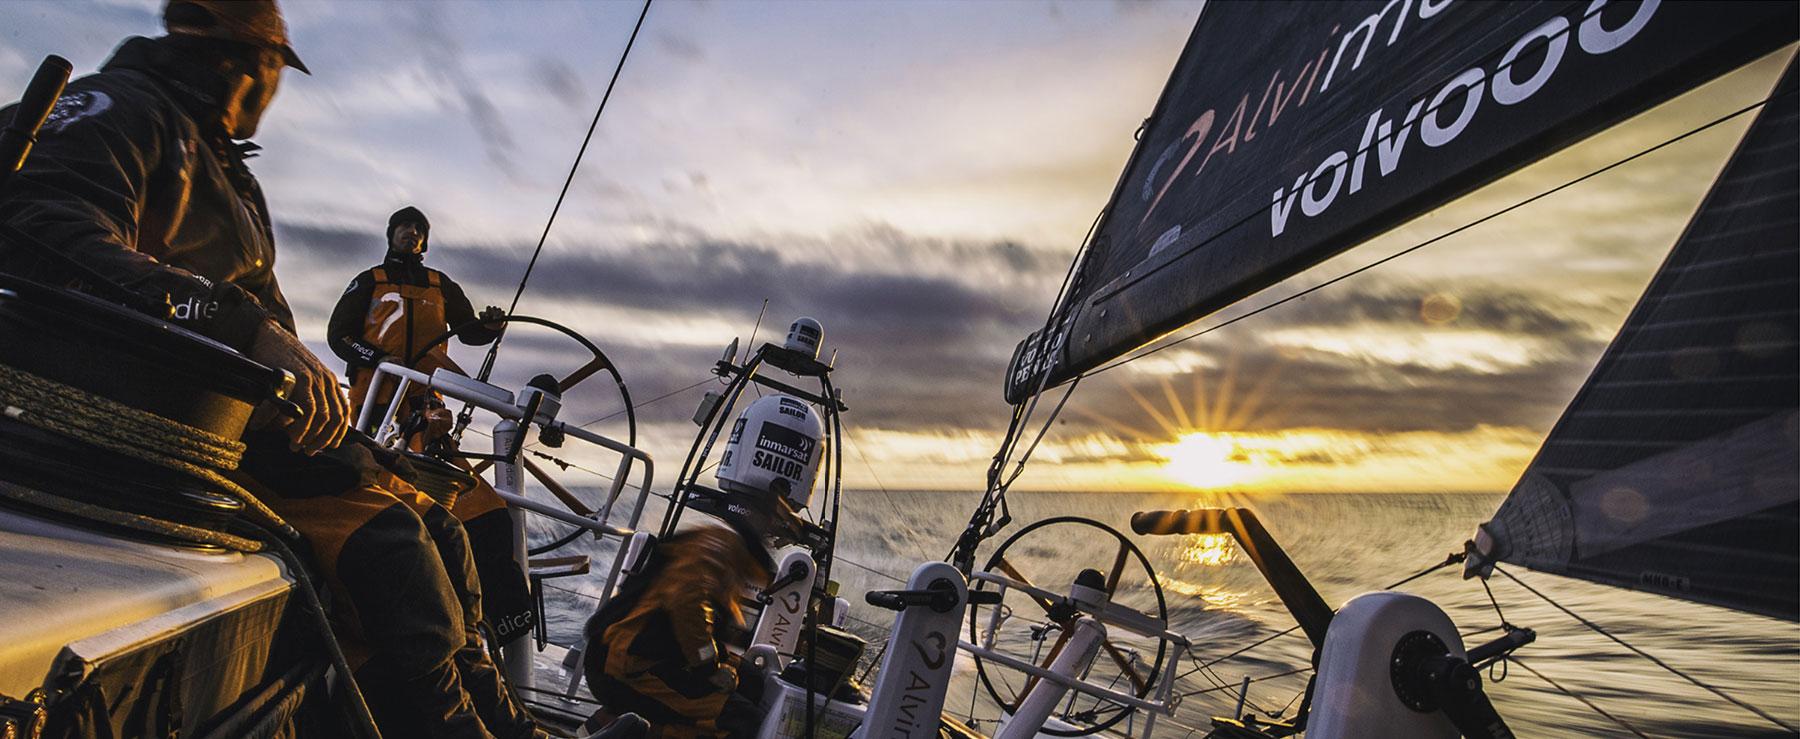 Yachtservice en refit acties